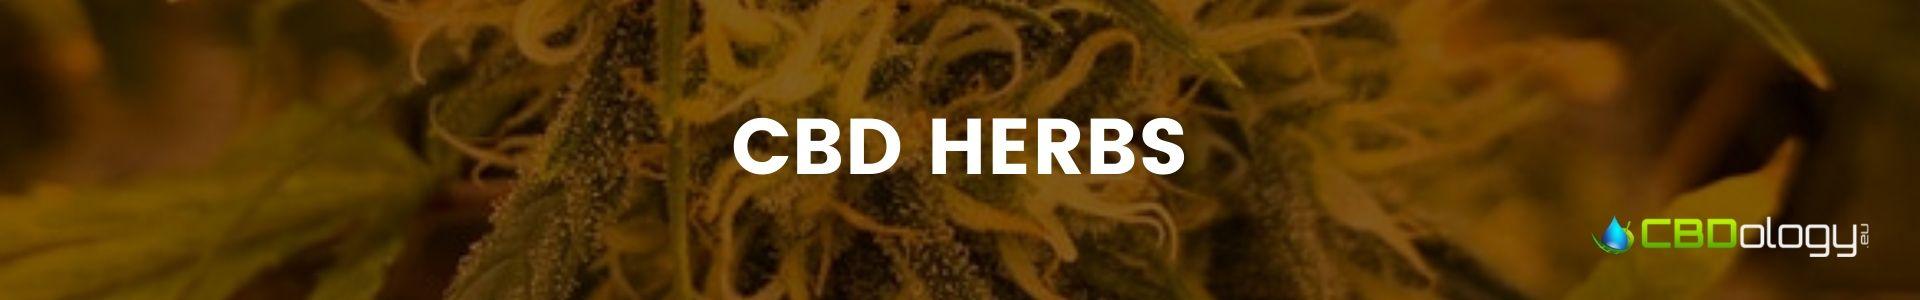 CBD Herbs